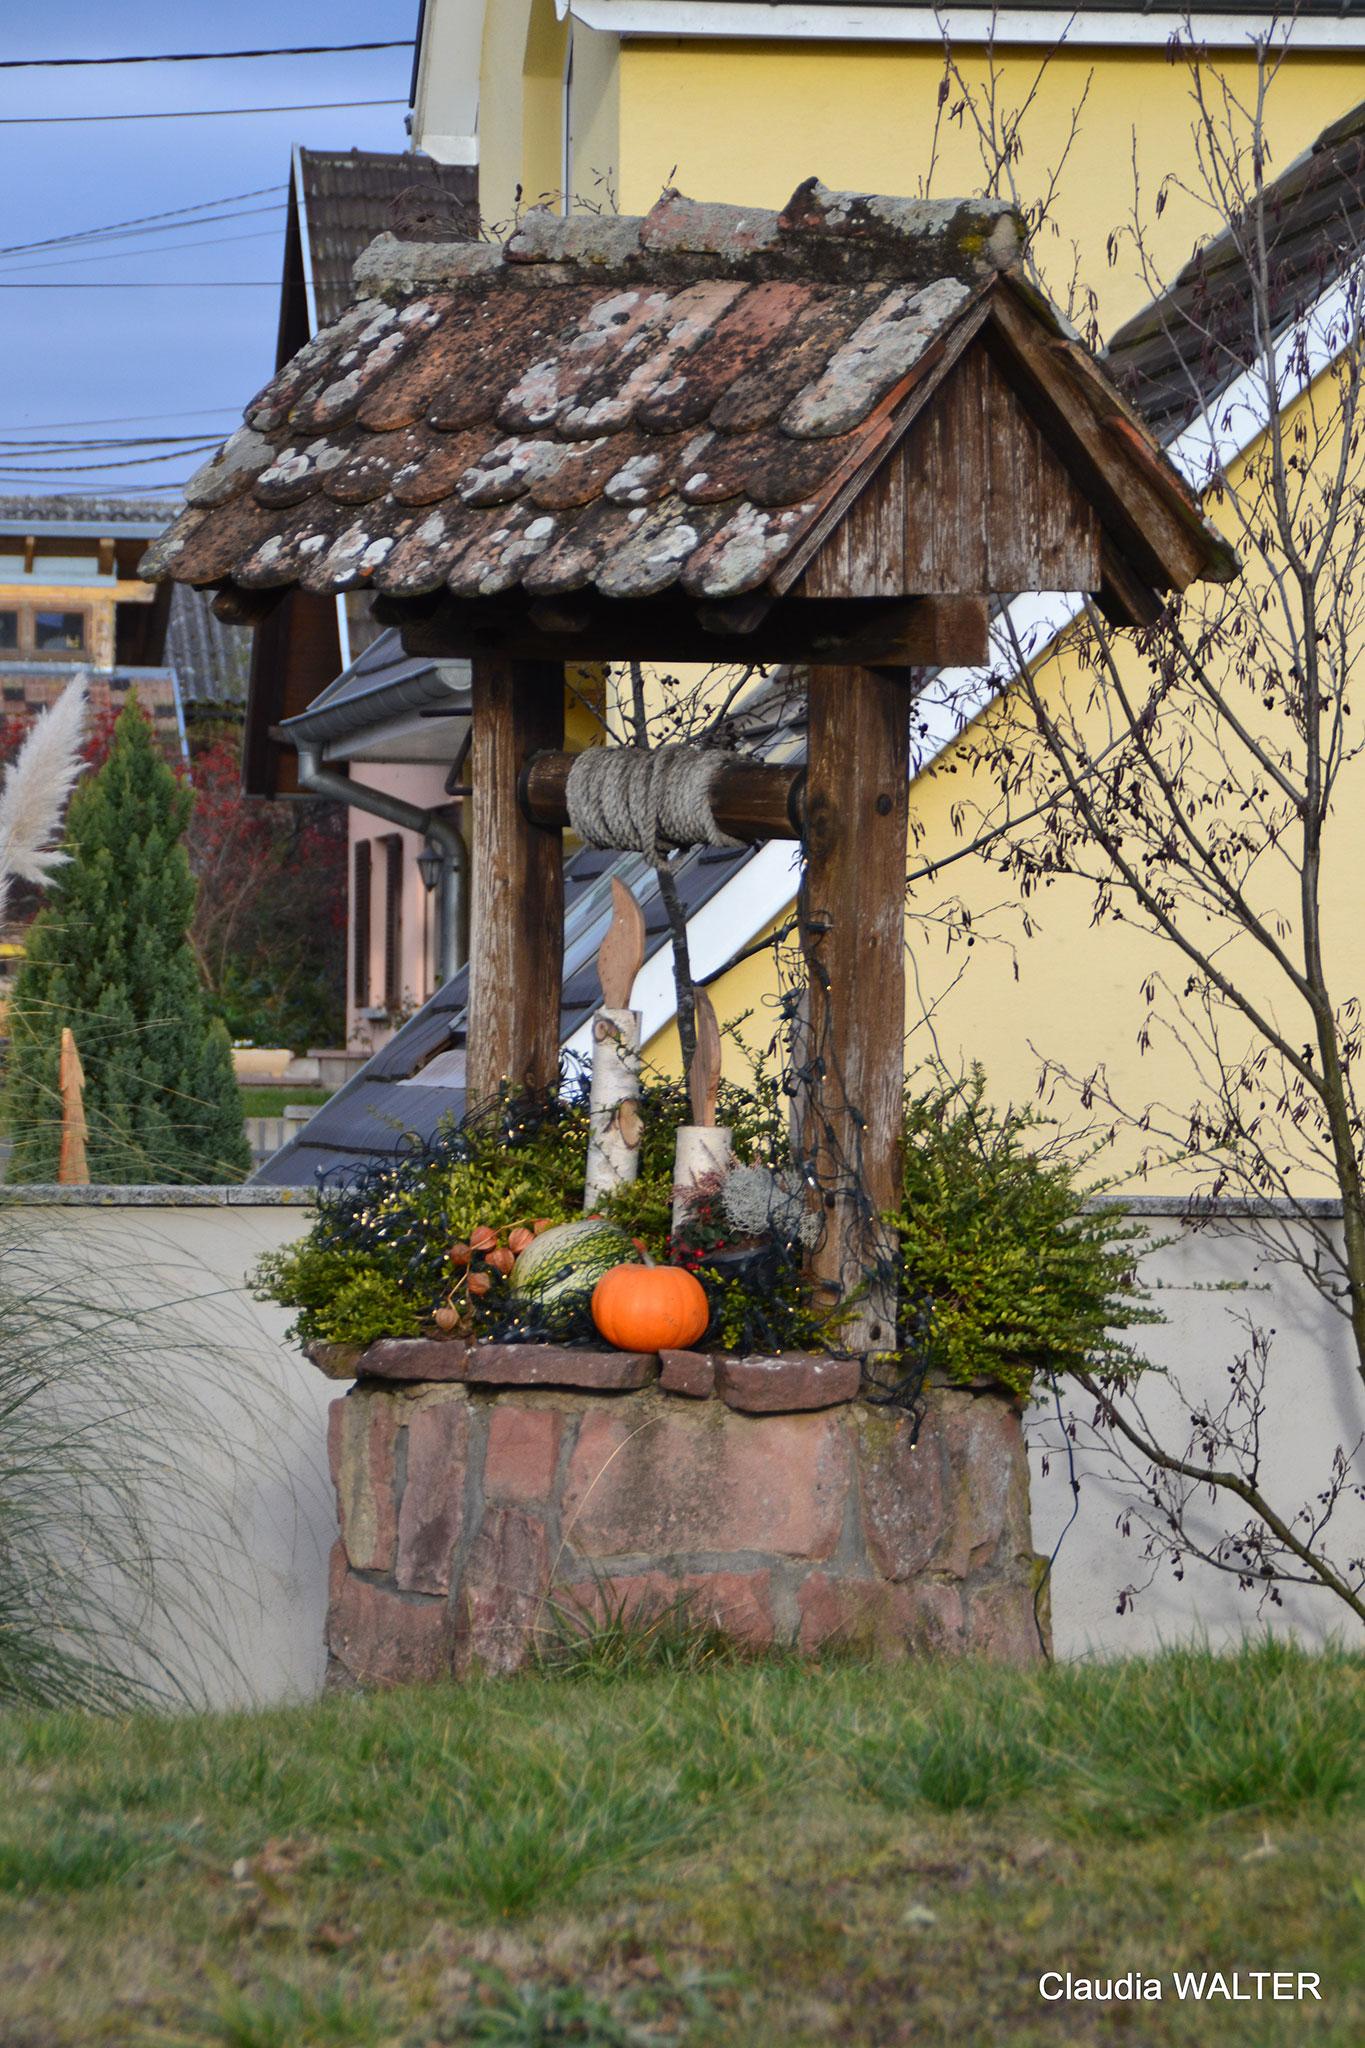 Moulin des potirons